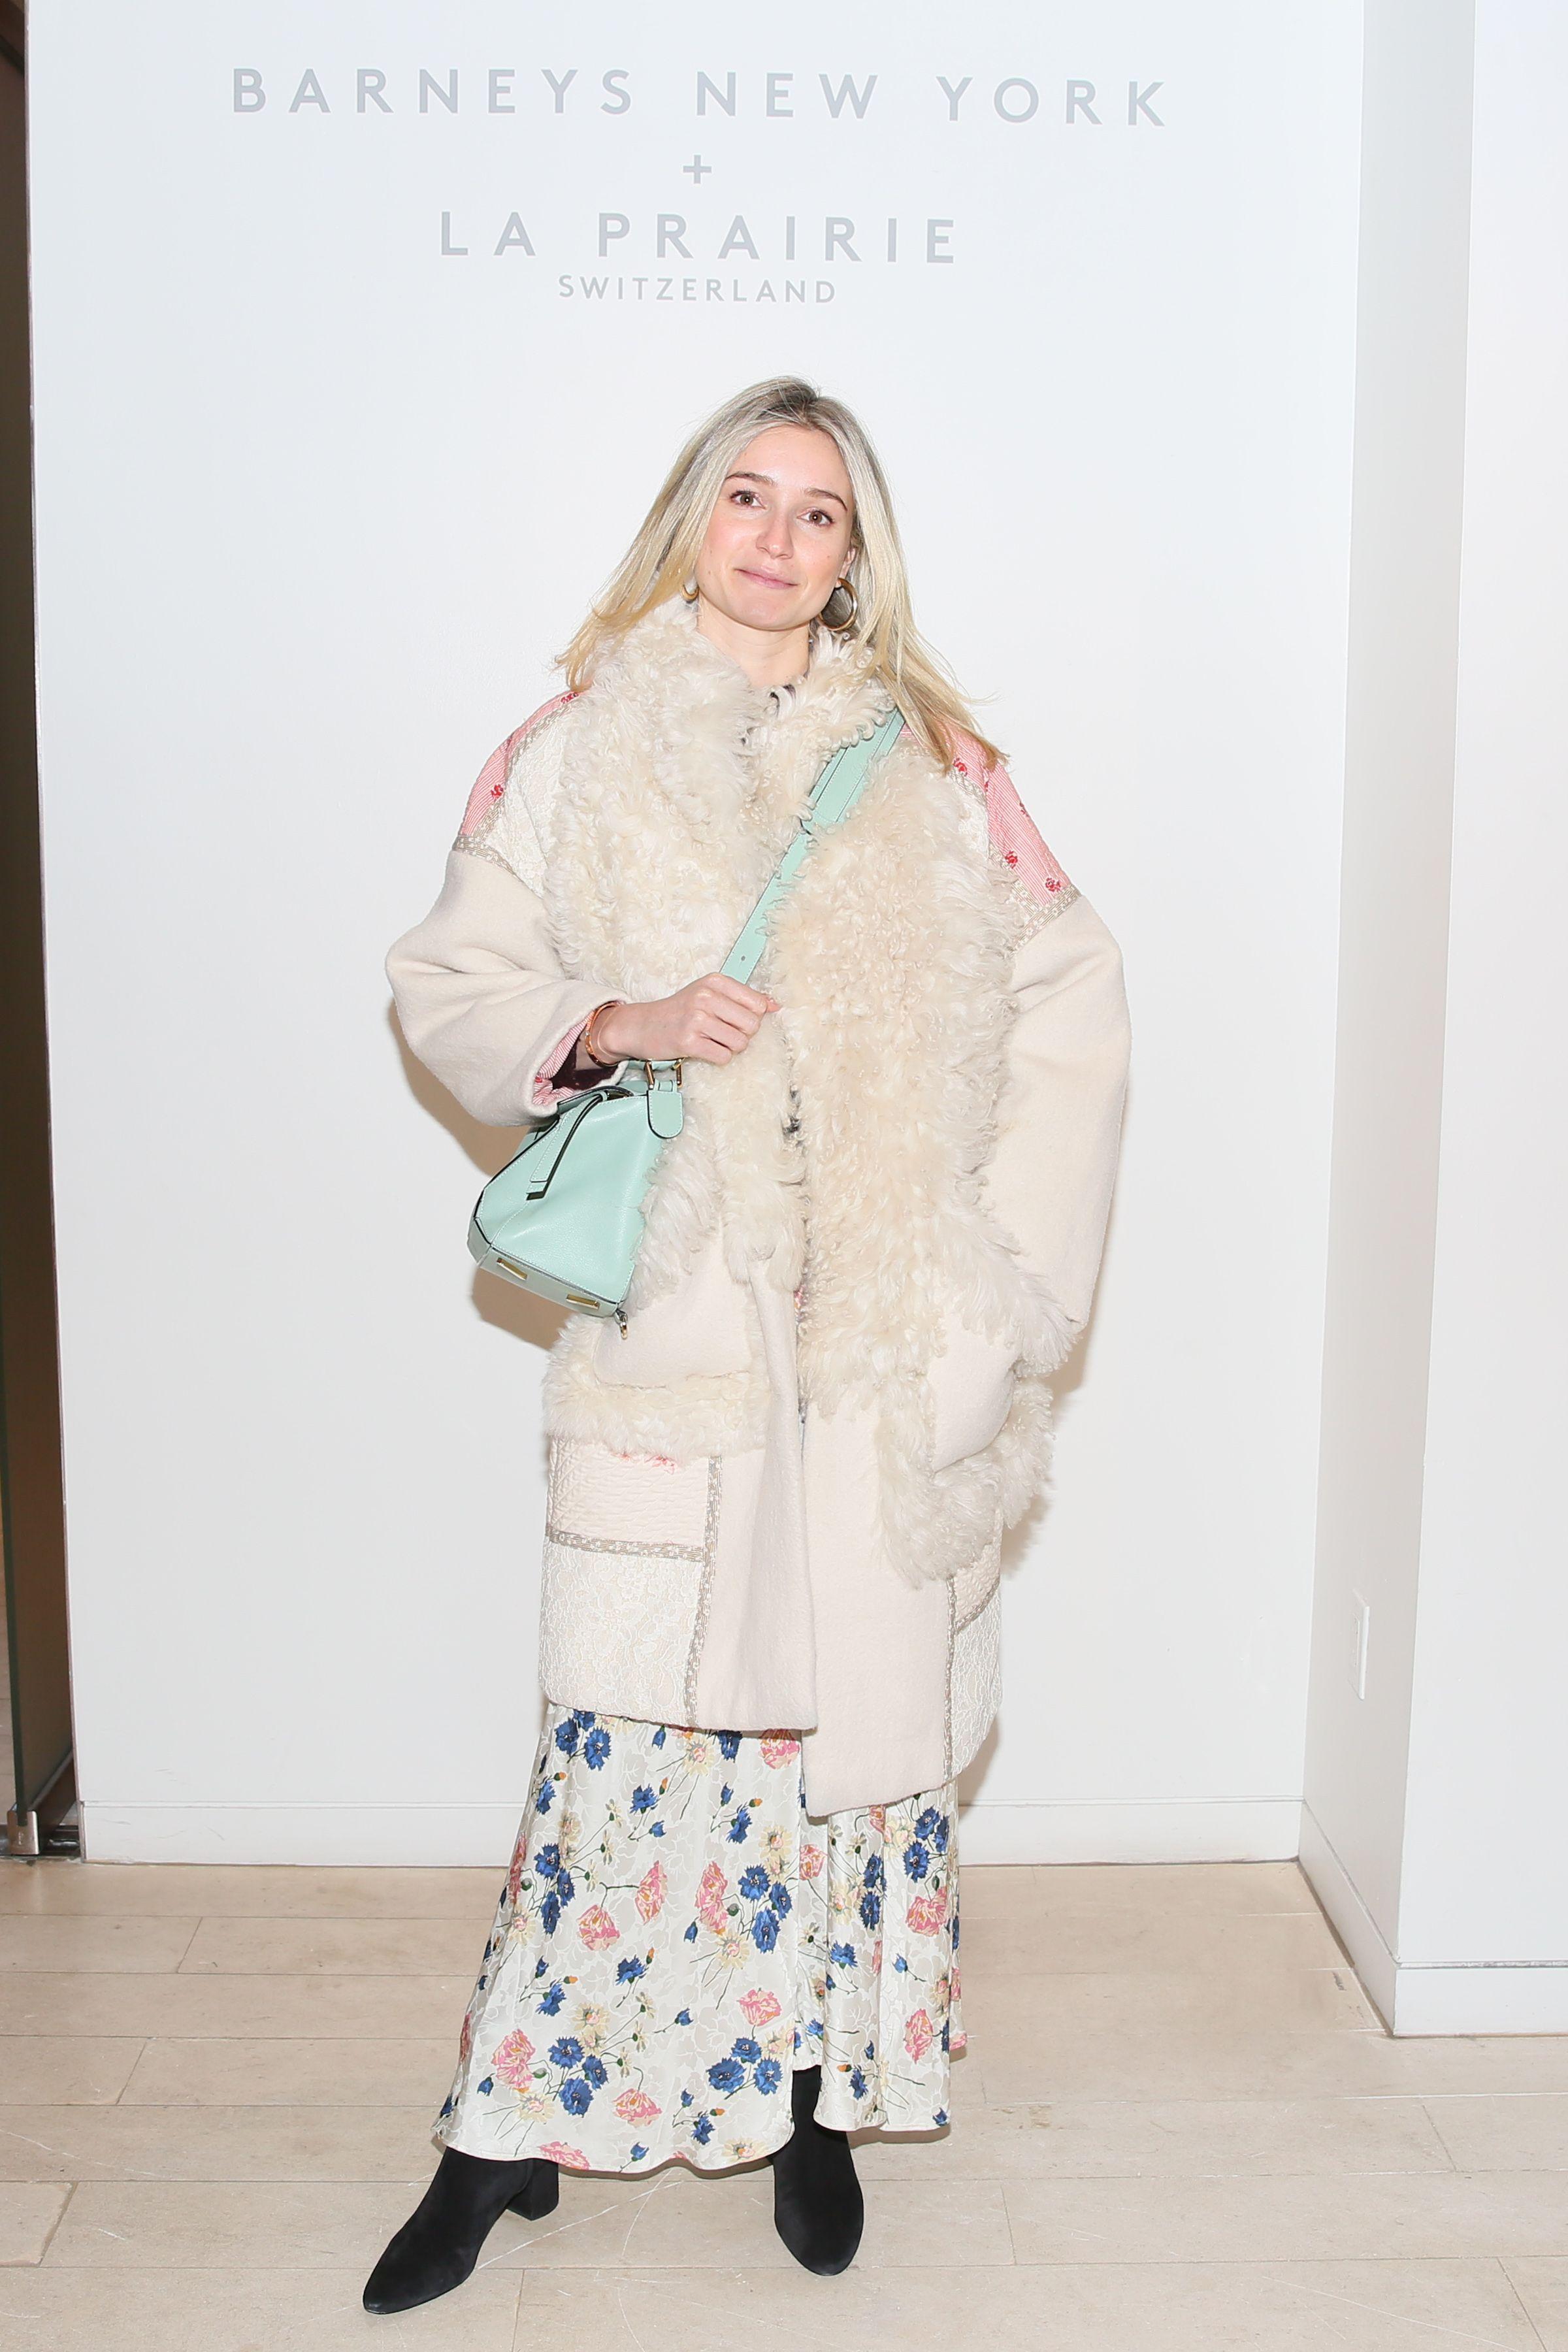 Samantha Sheinson Samantha Sheinson attends Barneys New York Madison Avenue to celebrate the launch of La Prairie on February 28.